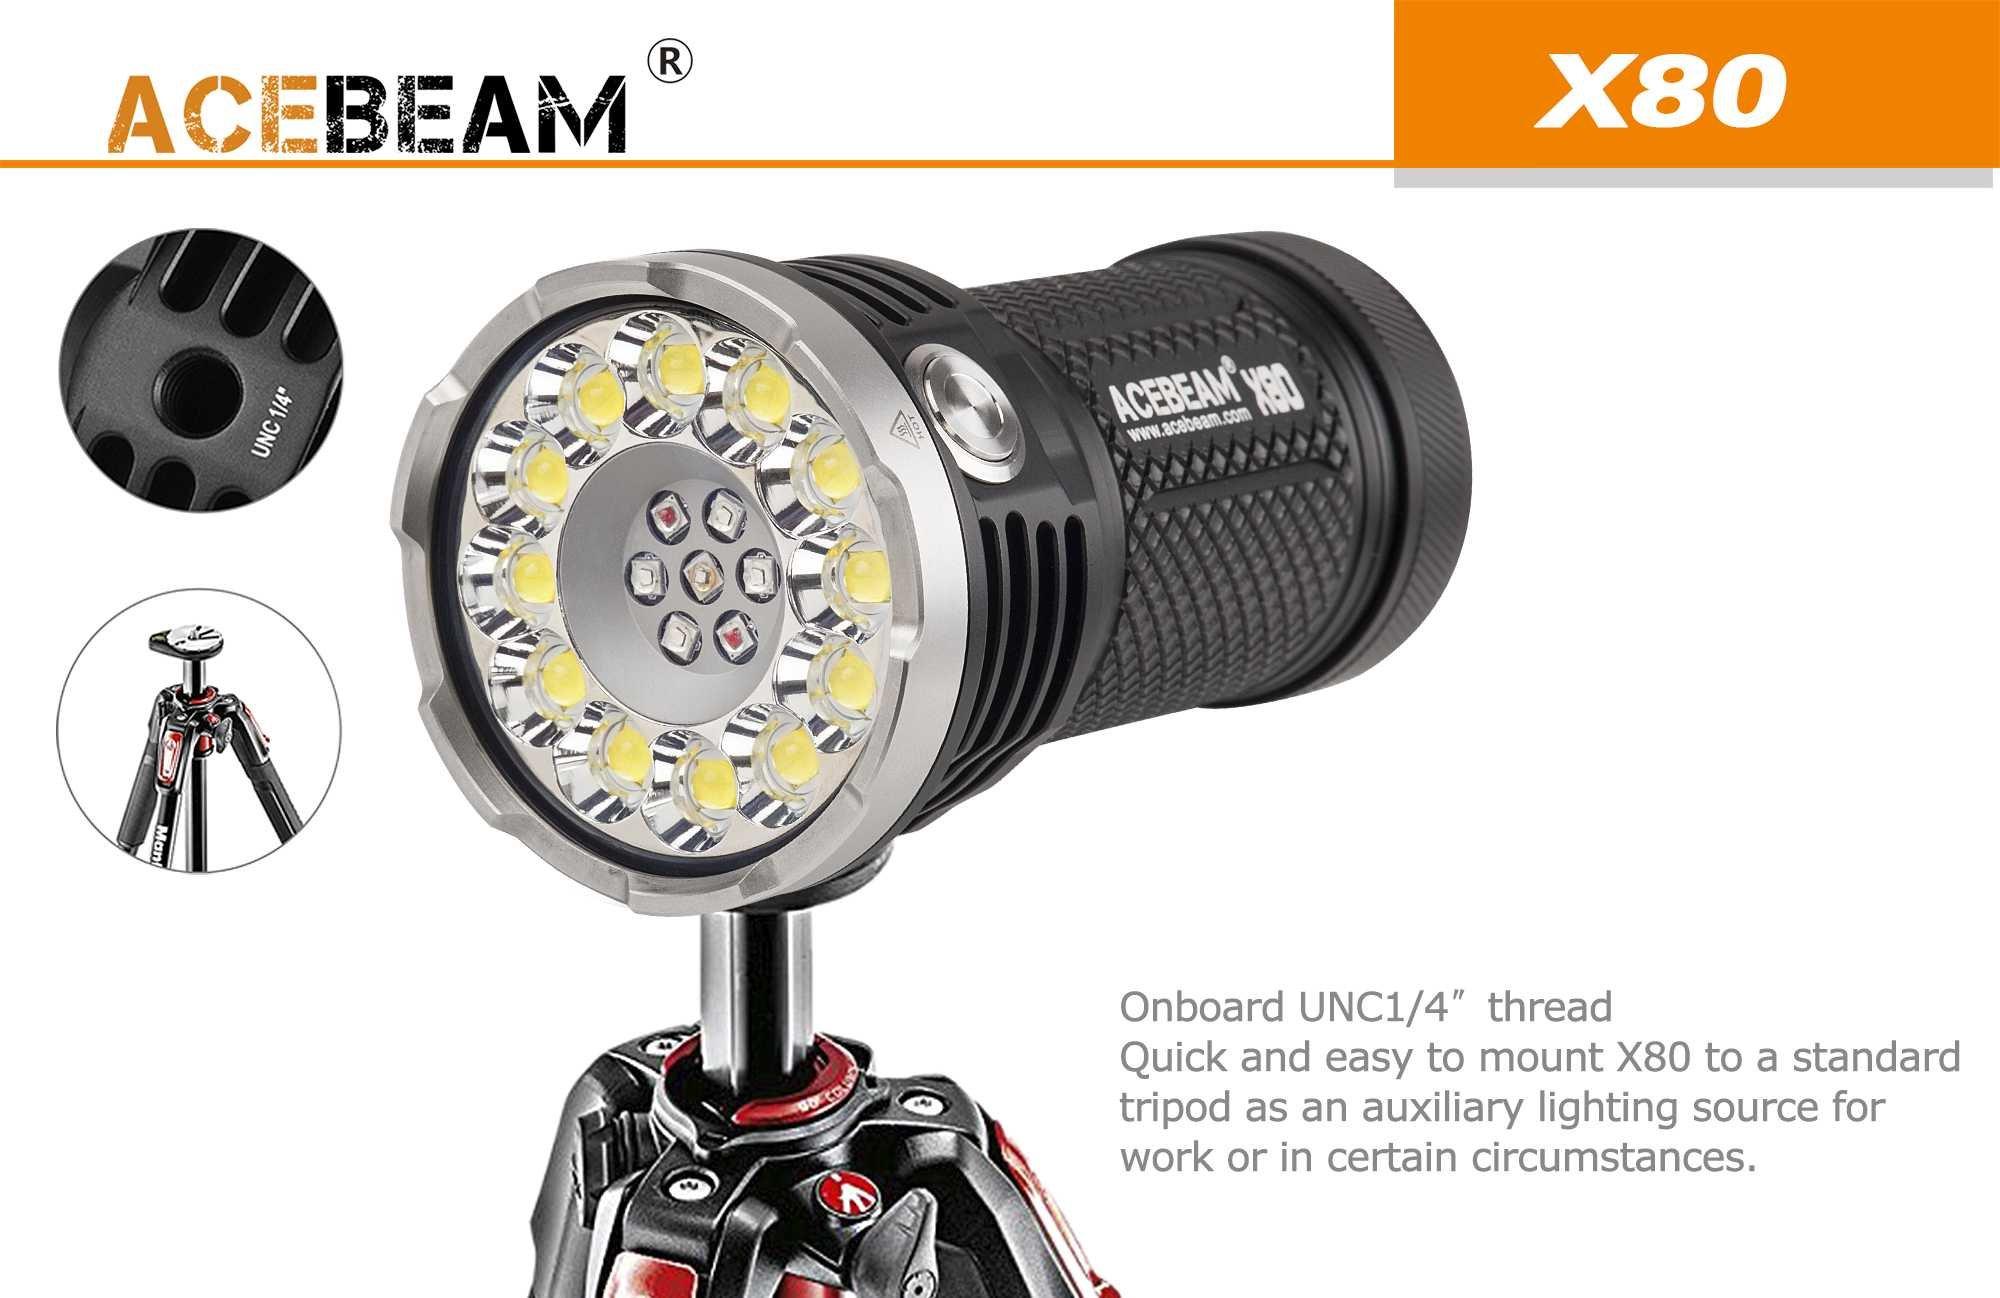 ACEBEAM X80 LED Flashlight 12x Cree XHP50.2 25000 Lumens 5-color Light Beam Flashlights Included 4 3100mah Batteries by Acebeam (Image #6)